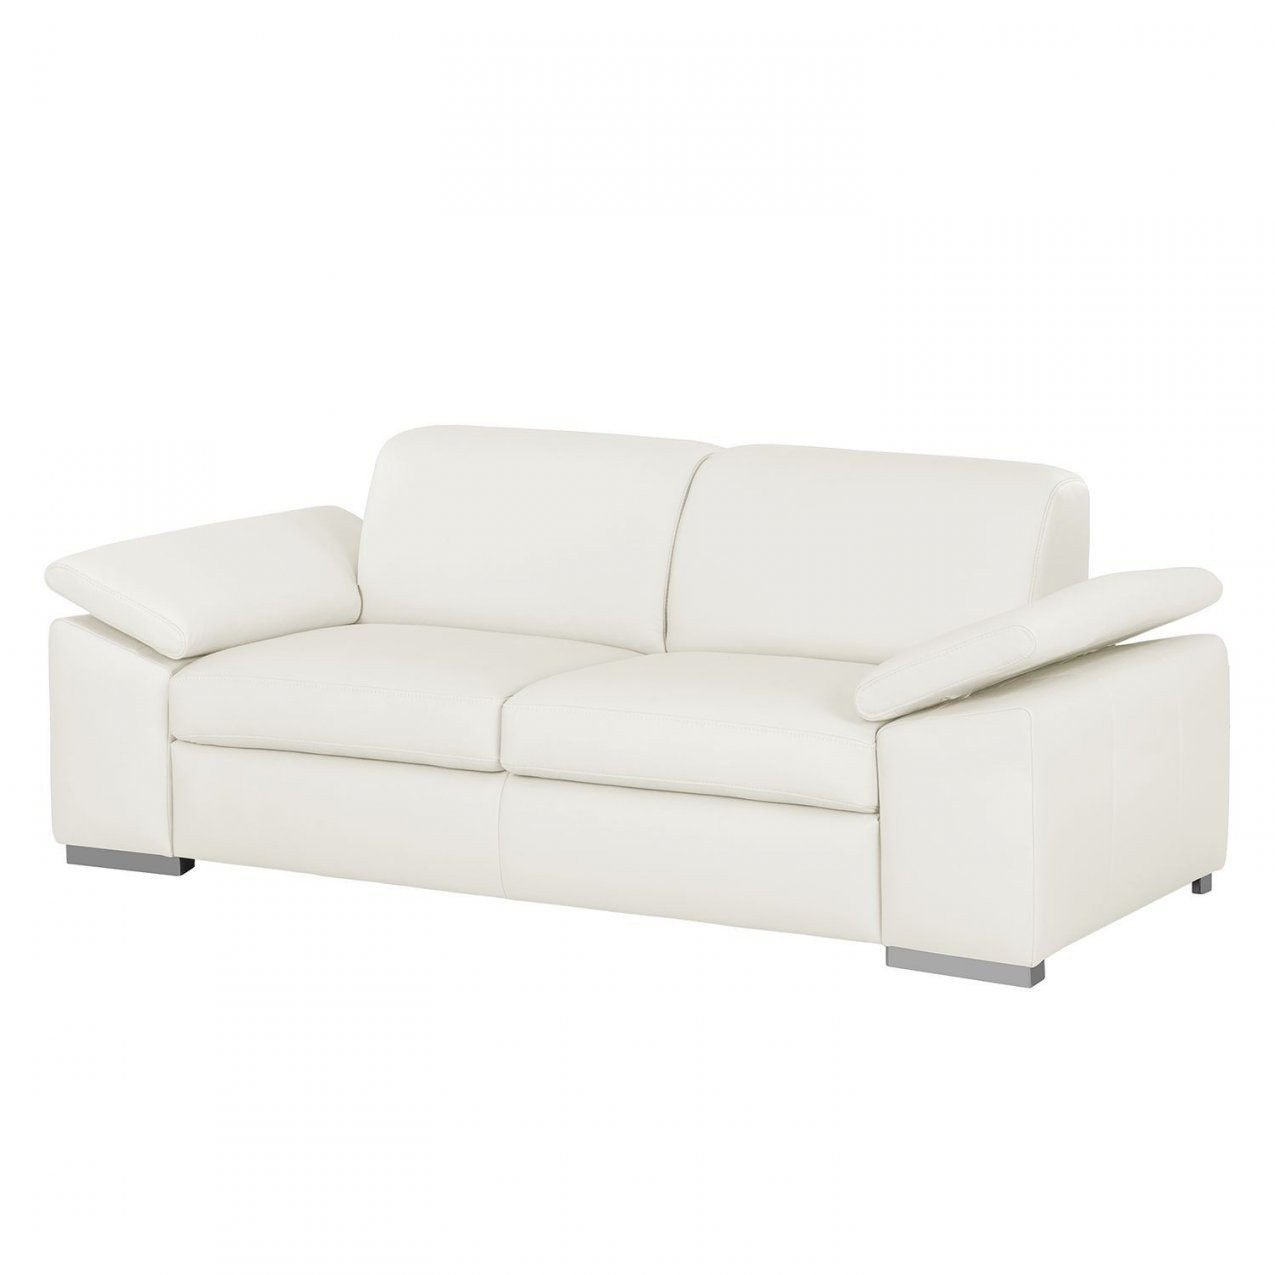 Sofa Ideen Charmant 2 Sitzer Sofa Mit Schlaffunktion Ikea von Ikea Sofa Mit Schlaffunktion Photo